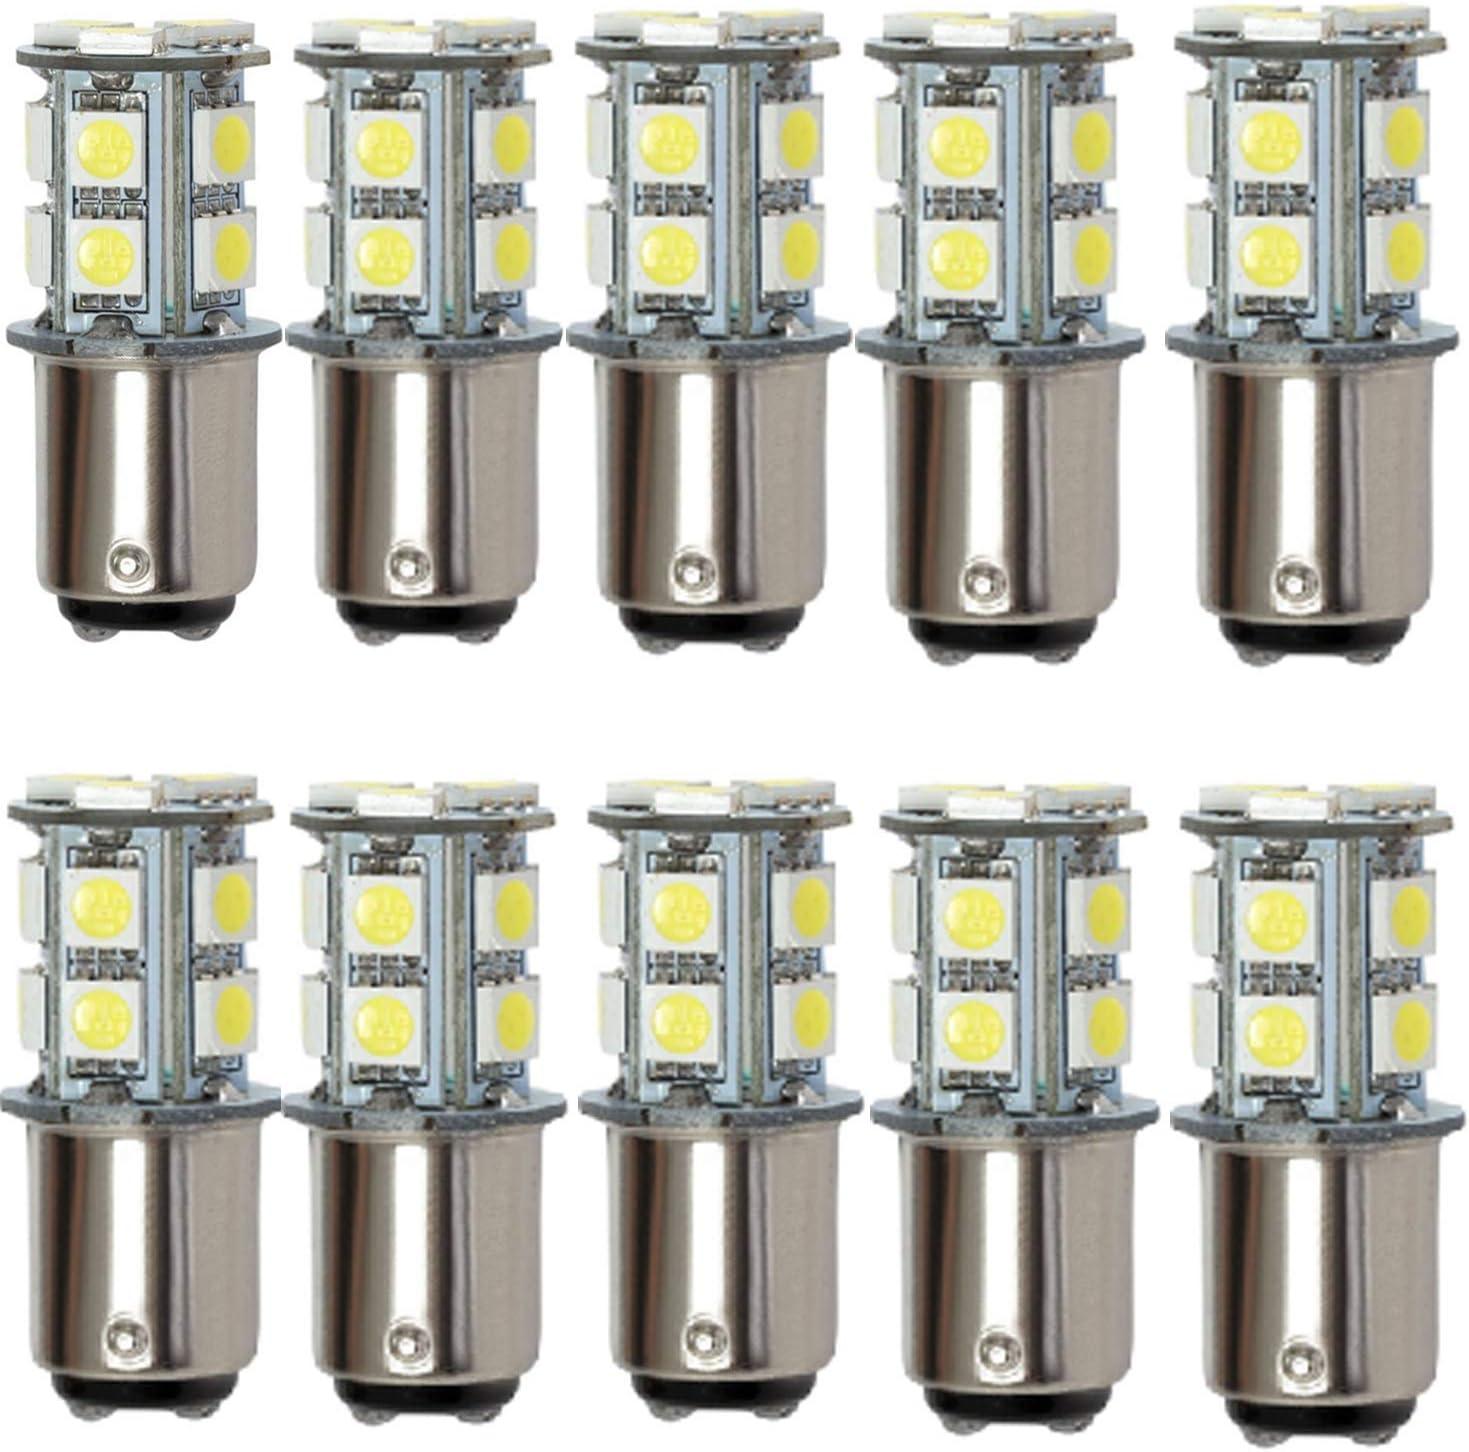 AIYOWEI BA15D 1142 1076 1176 - Bombilla LED para coche (13-5050SMD AC/DC12V-24V, 10 unidades), color blanco